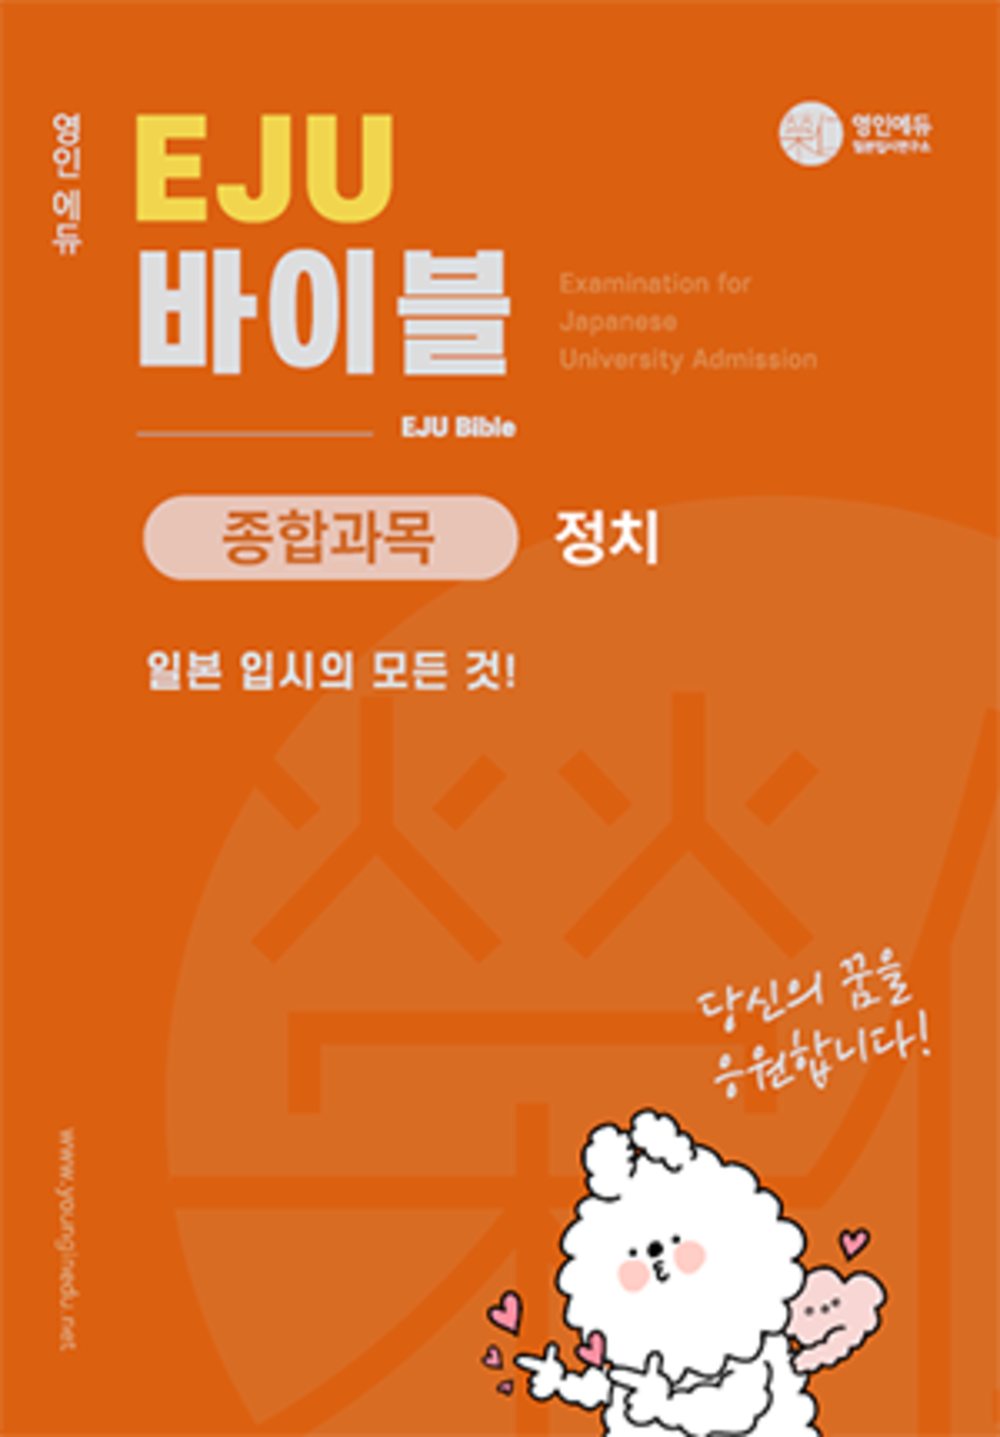 EJU 바이블_종합과목_정치  (교재만 개별 구매  불가)